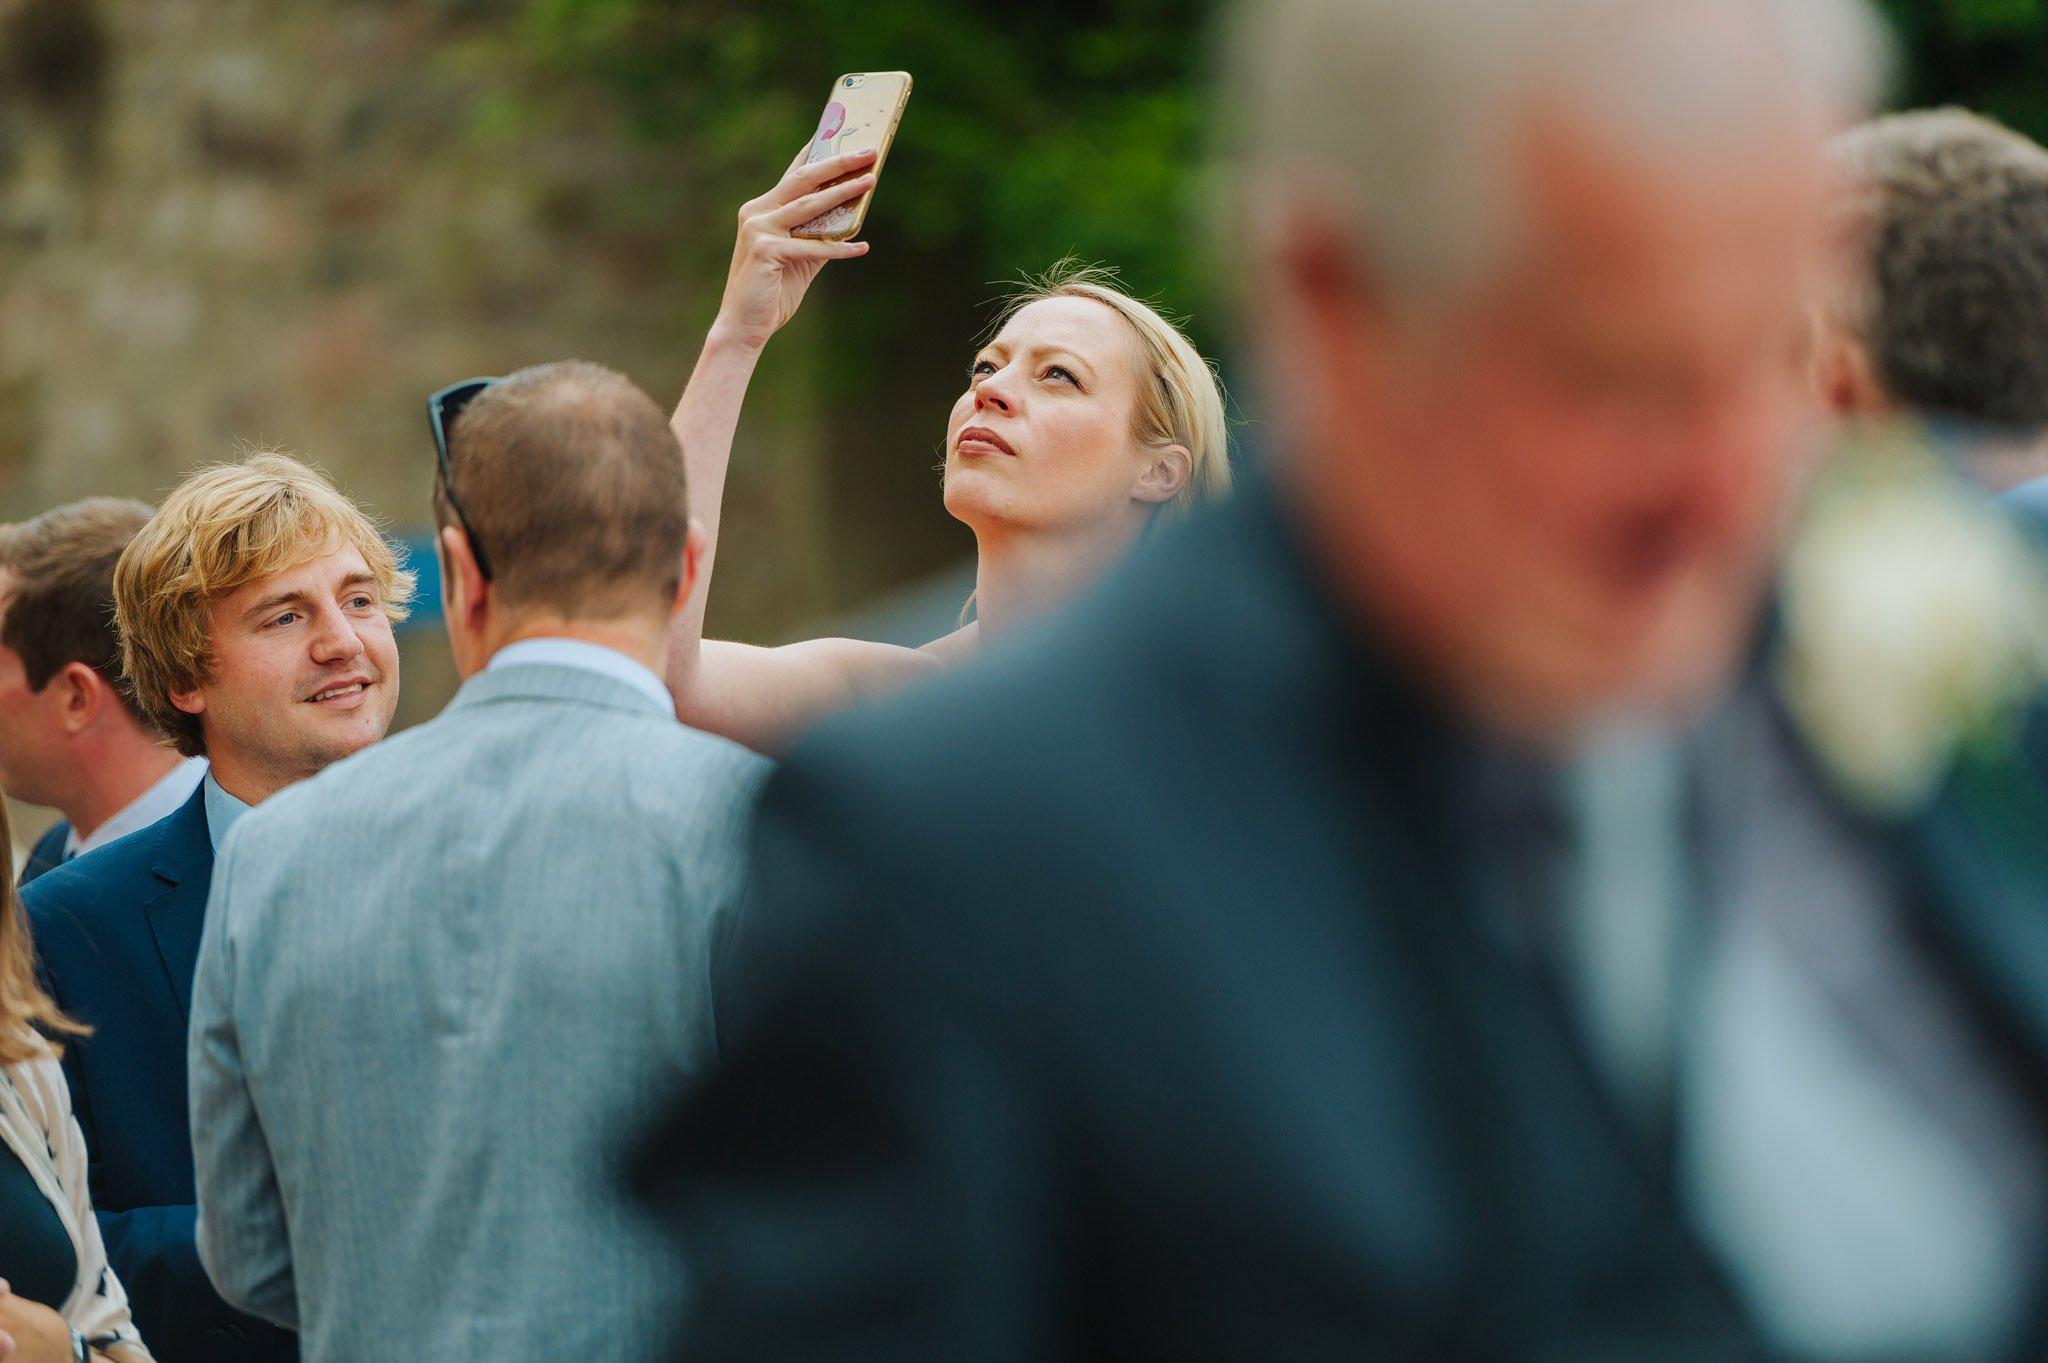 Georgina + Mike - Wedding photography in Malvern, Worcestershire 8